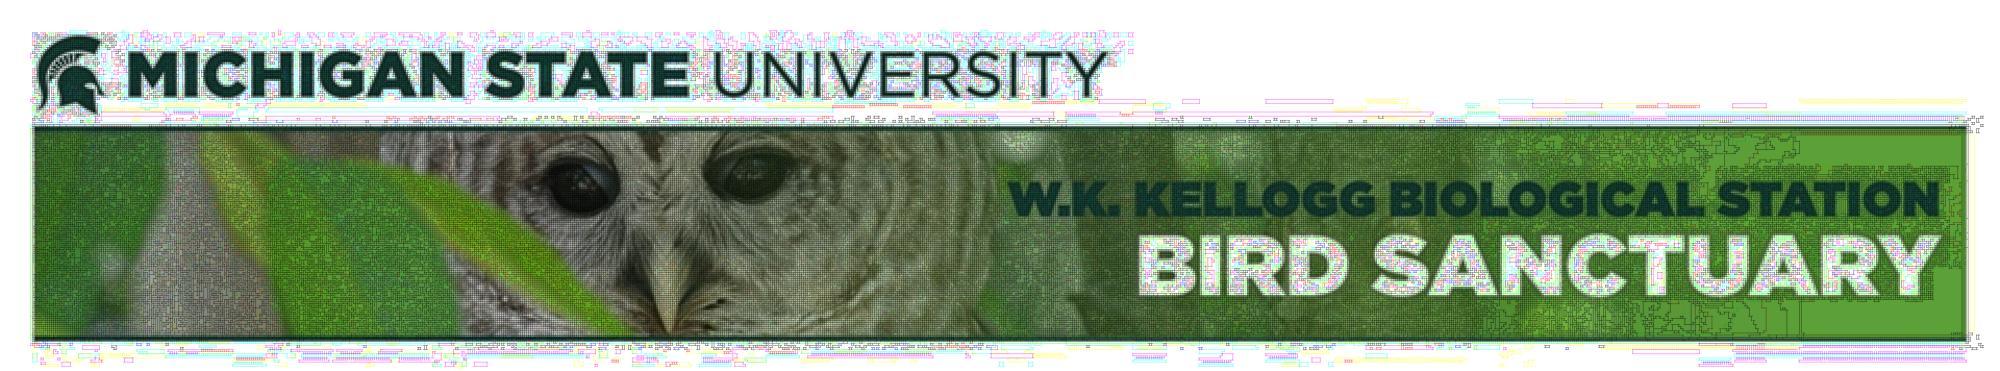 Michigan State University W.K. Kellogg Bird Sanctuary with image of a Barred Owl.